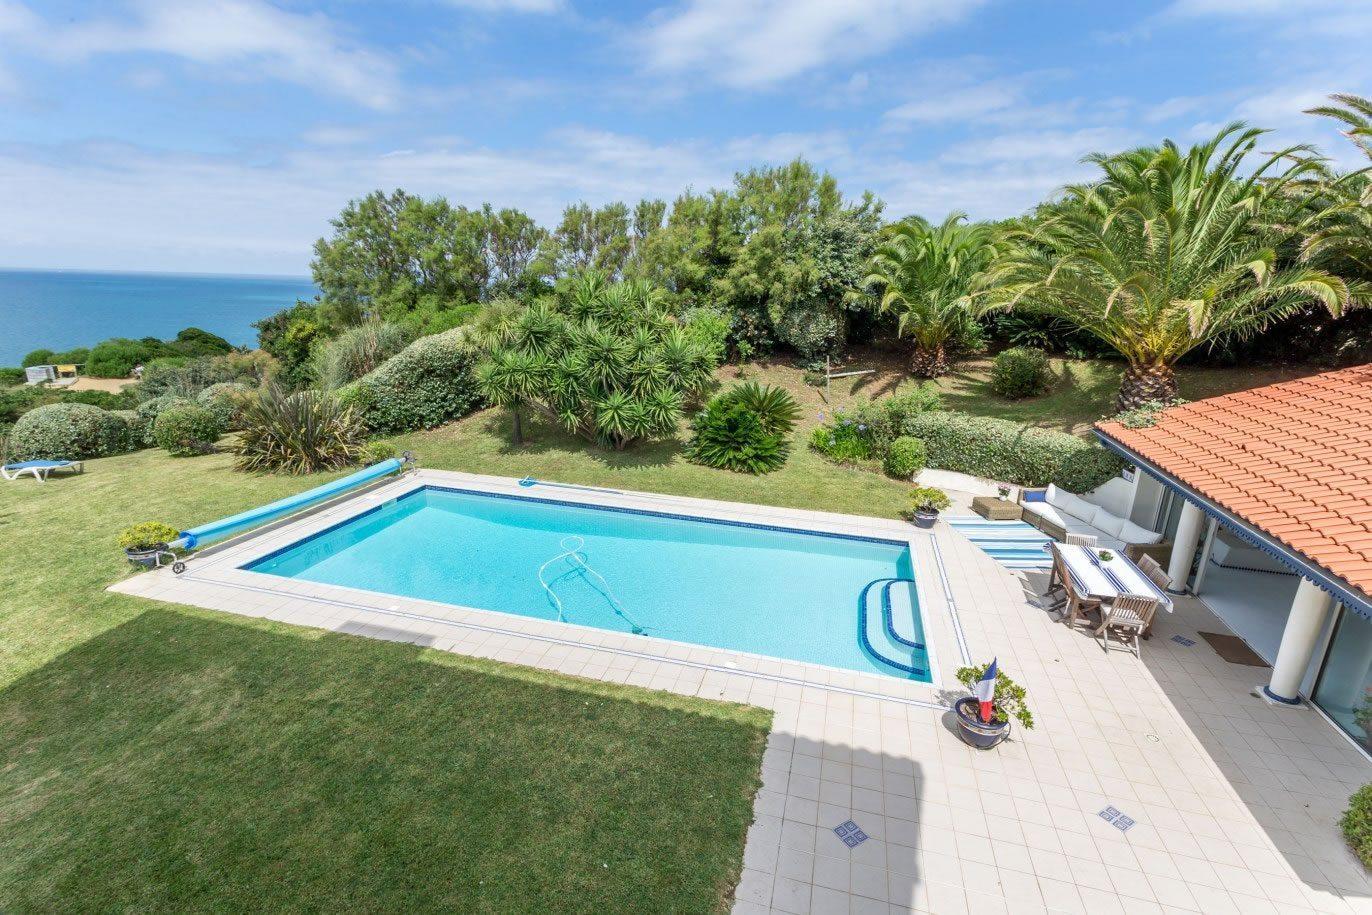 Basque Family Villa Pool For Rent Bidart Access